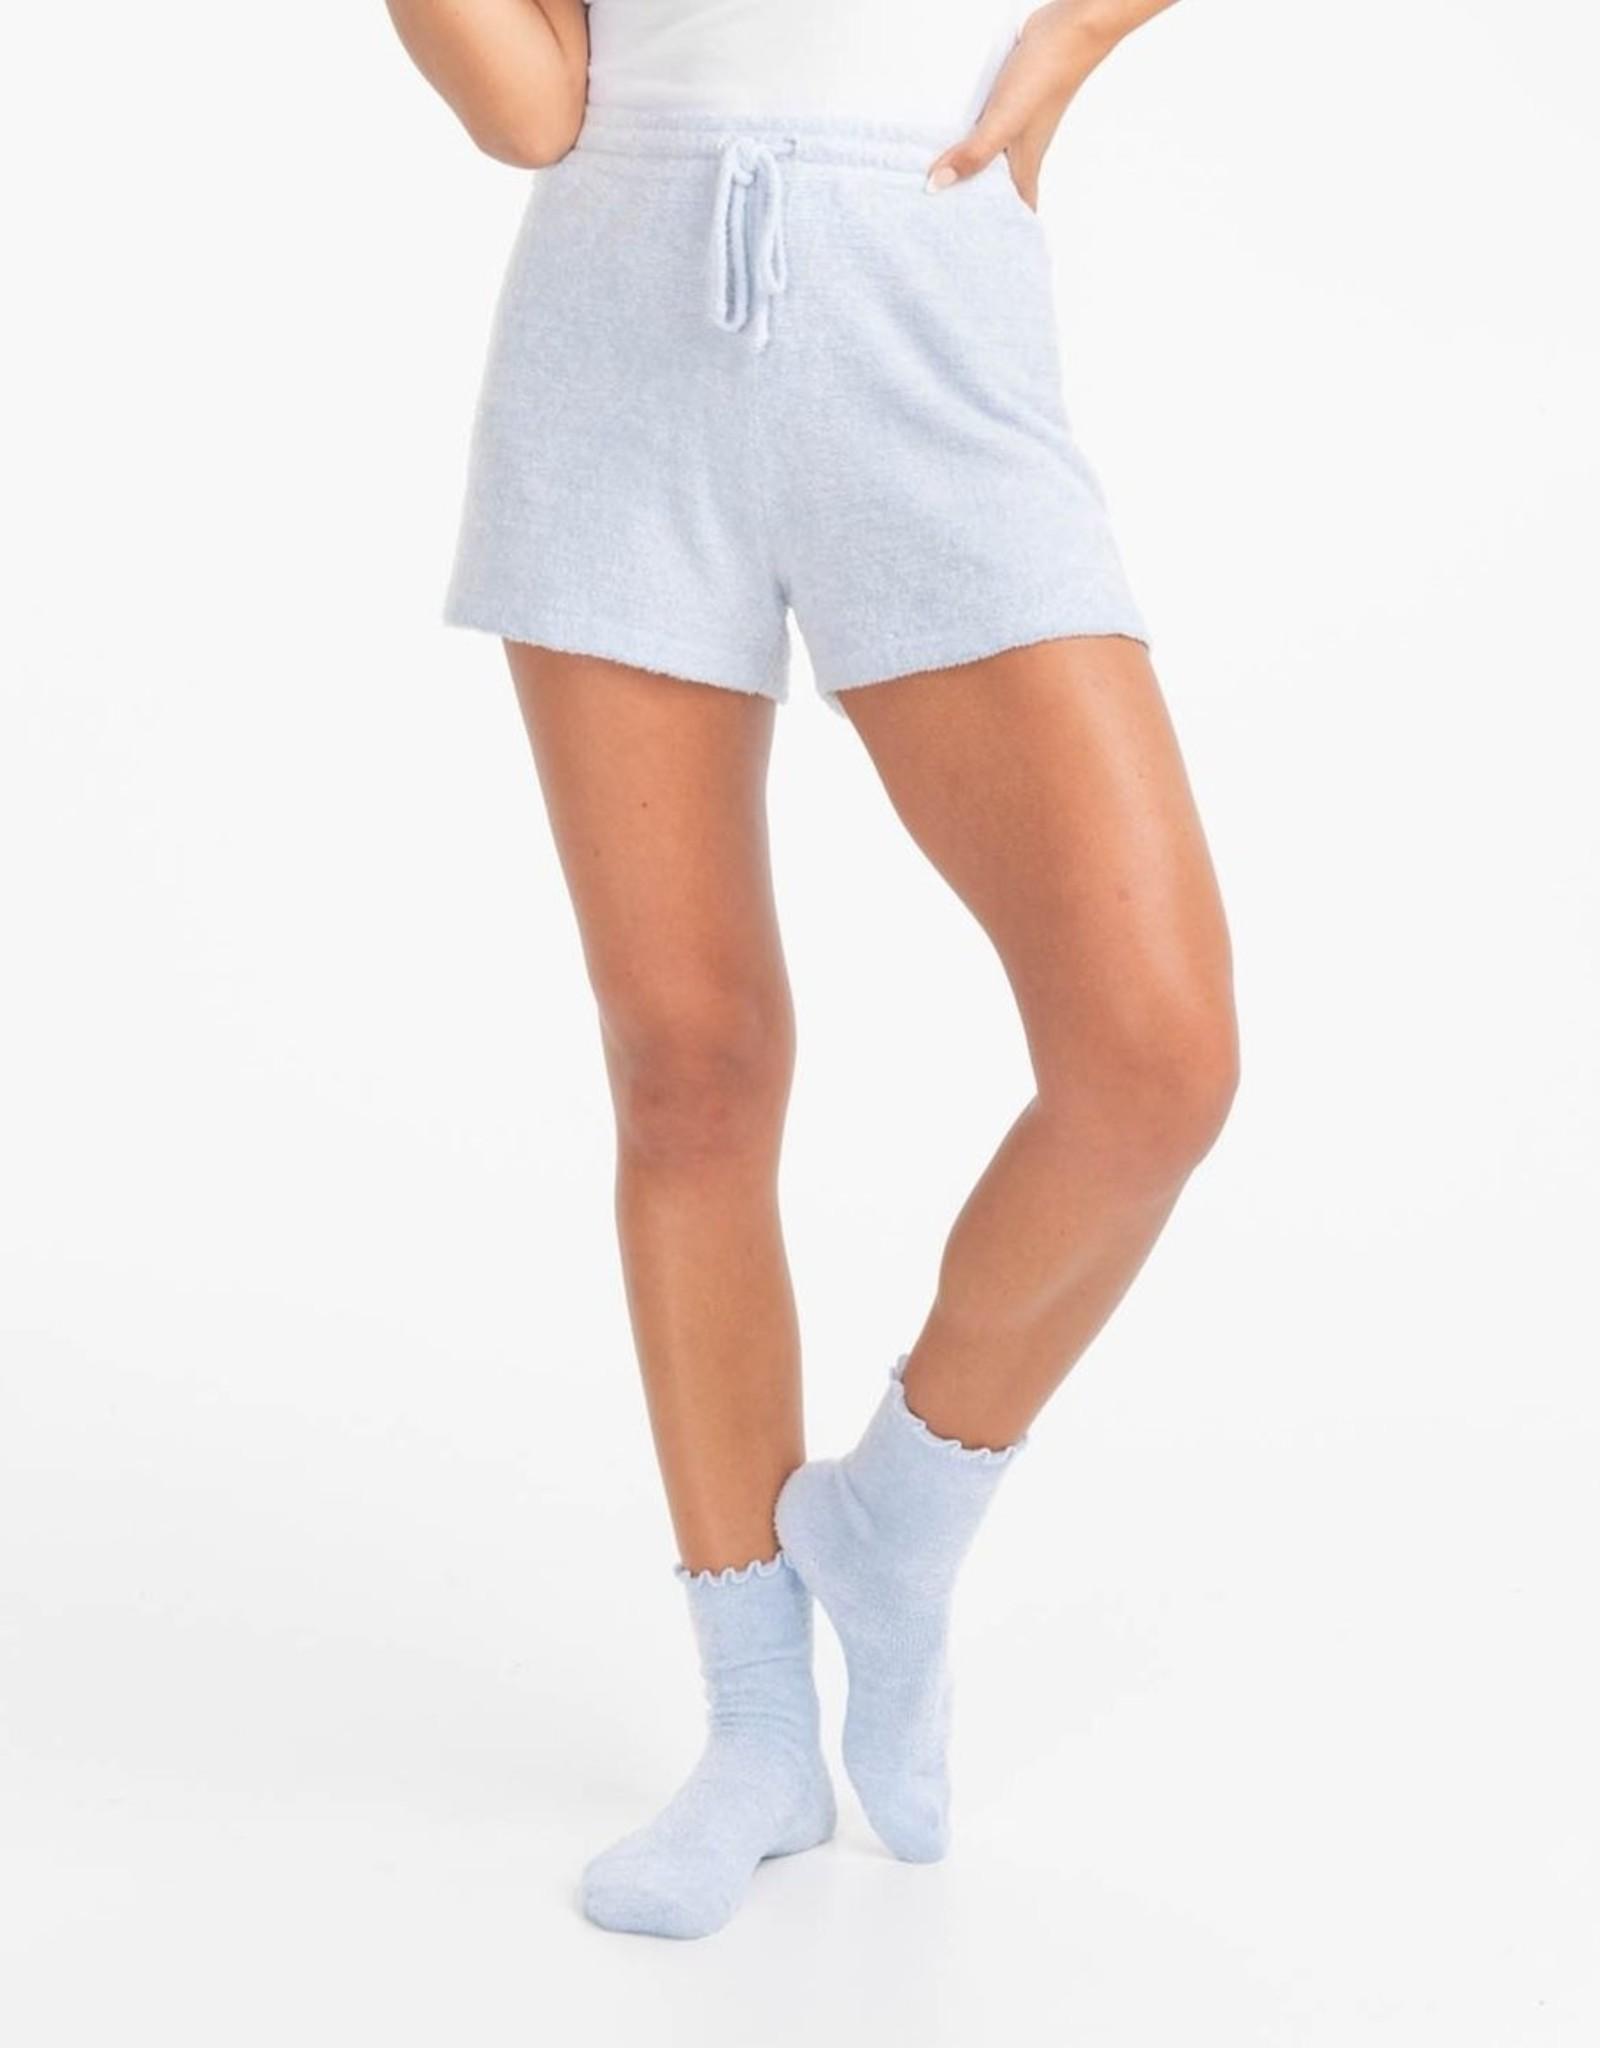 Southern Shirt Dreamluxe Lounge Shorts